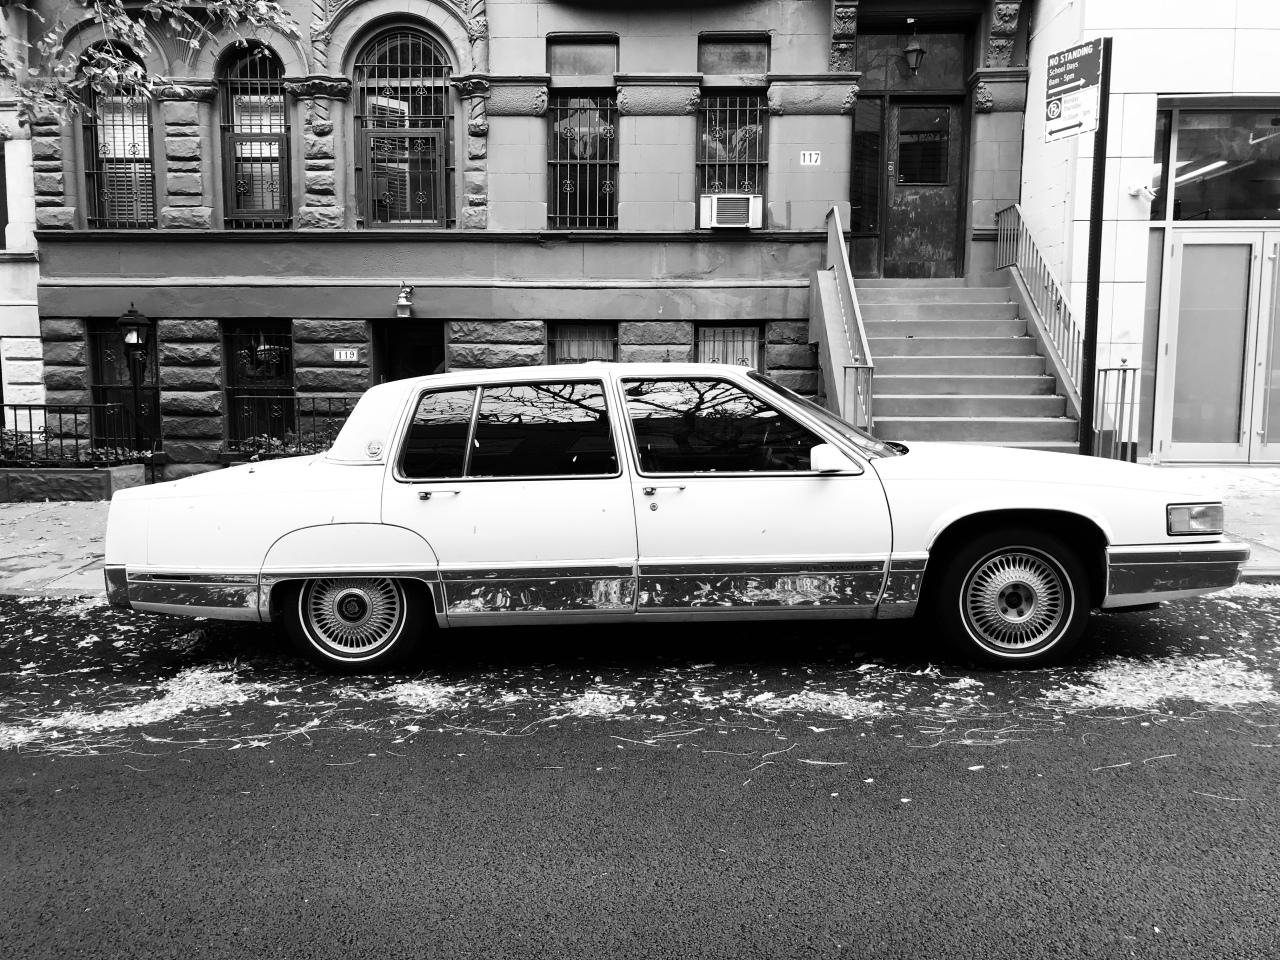 NYC: An UrbanSafari